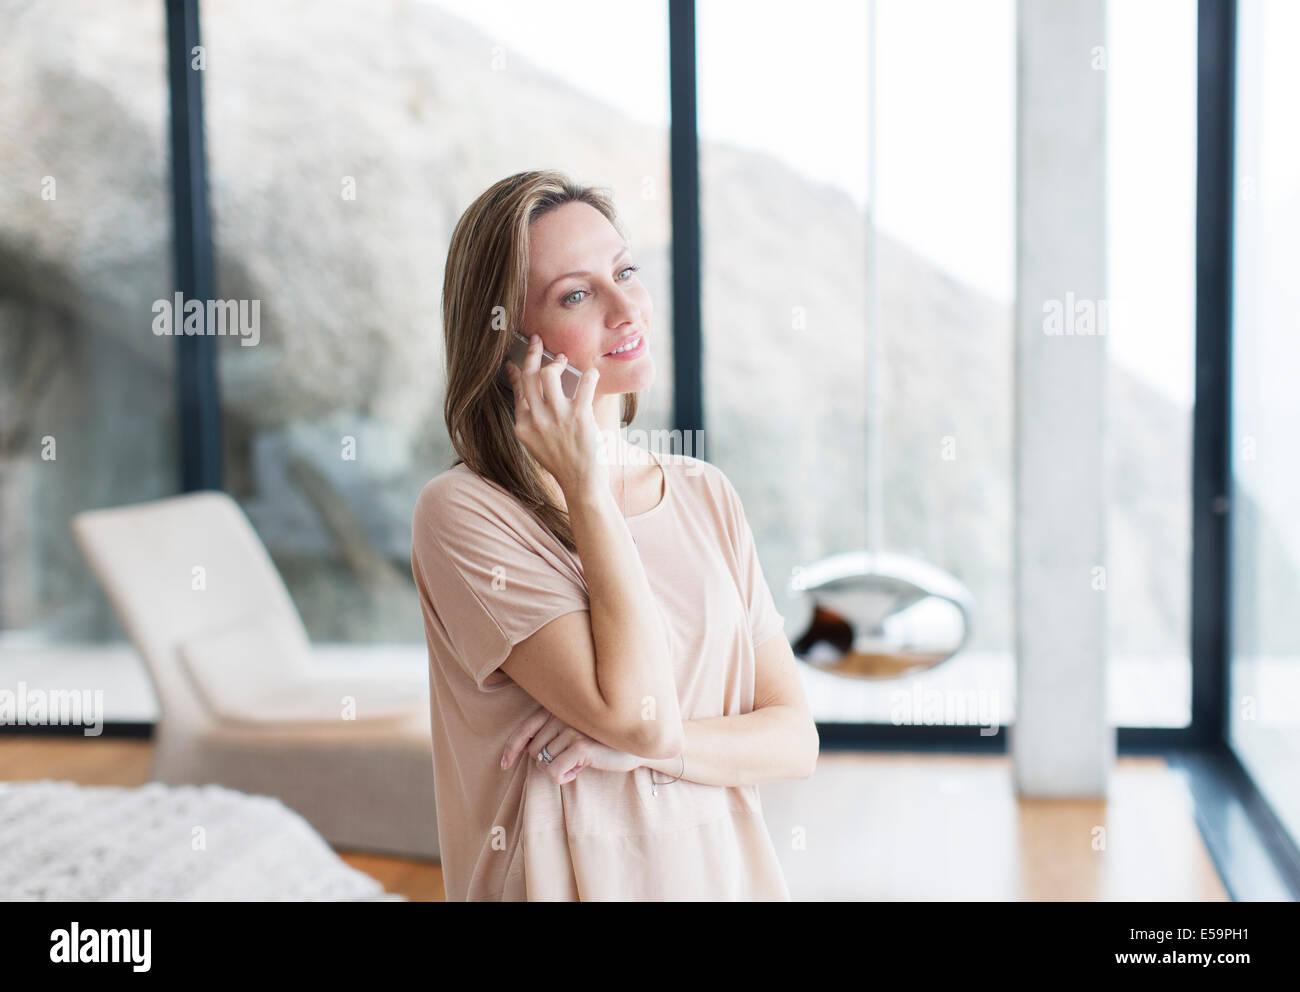 Mujer hablando por teléfono celular en la moderna sala de estar Imagen De Stock